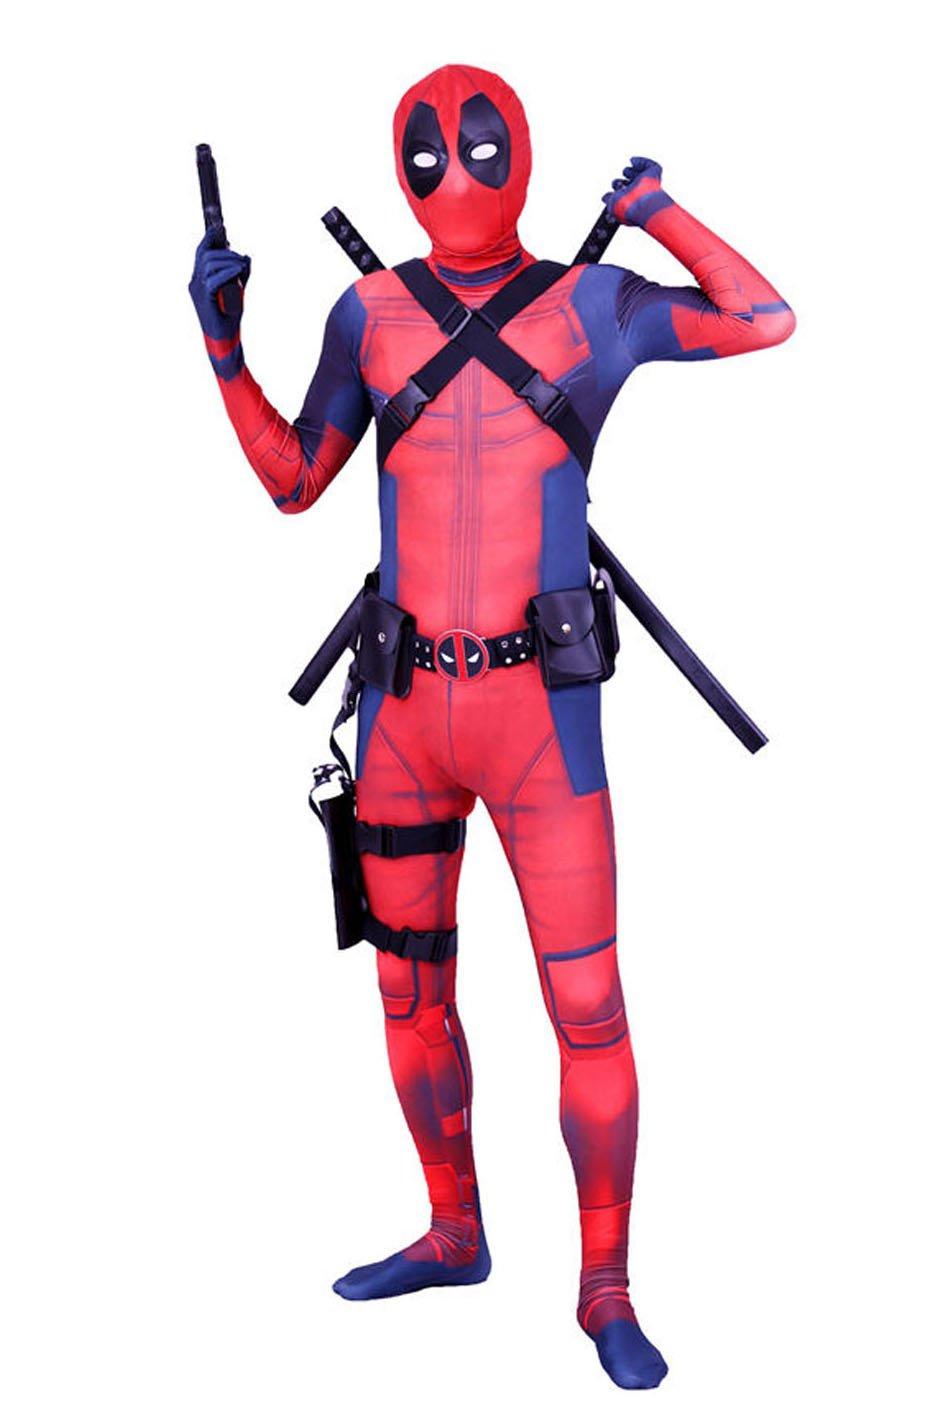 Danlier Halloween Cospaly Dress Up 3D Party Costume Lycra Onesie Spandex Zentai 61JS 2BEziD2L